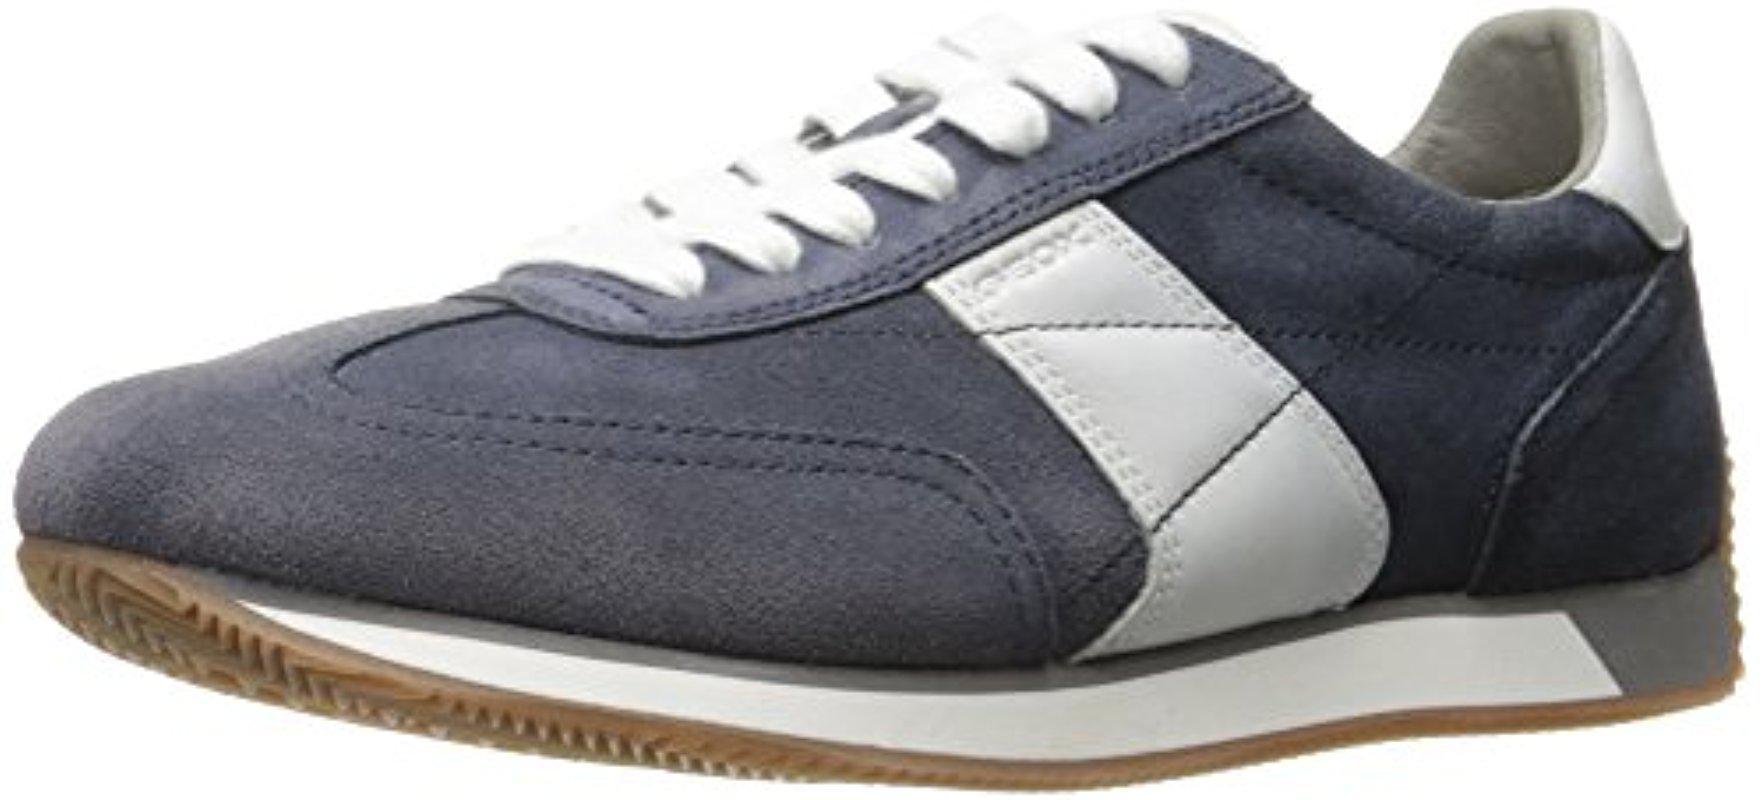 Mens U Vinto a Fashion Sneaker, Navy Geox